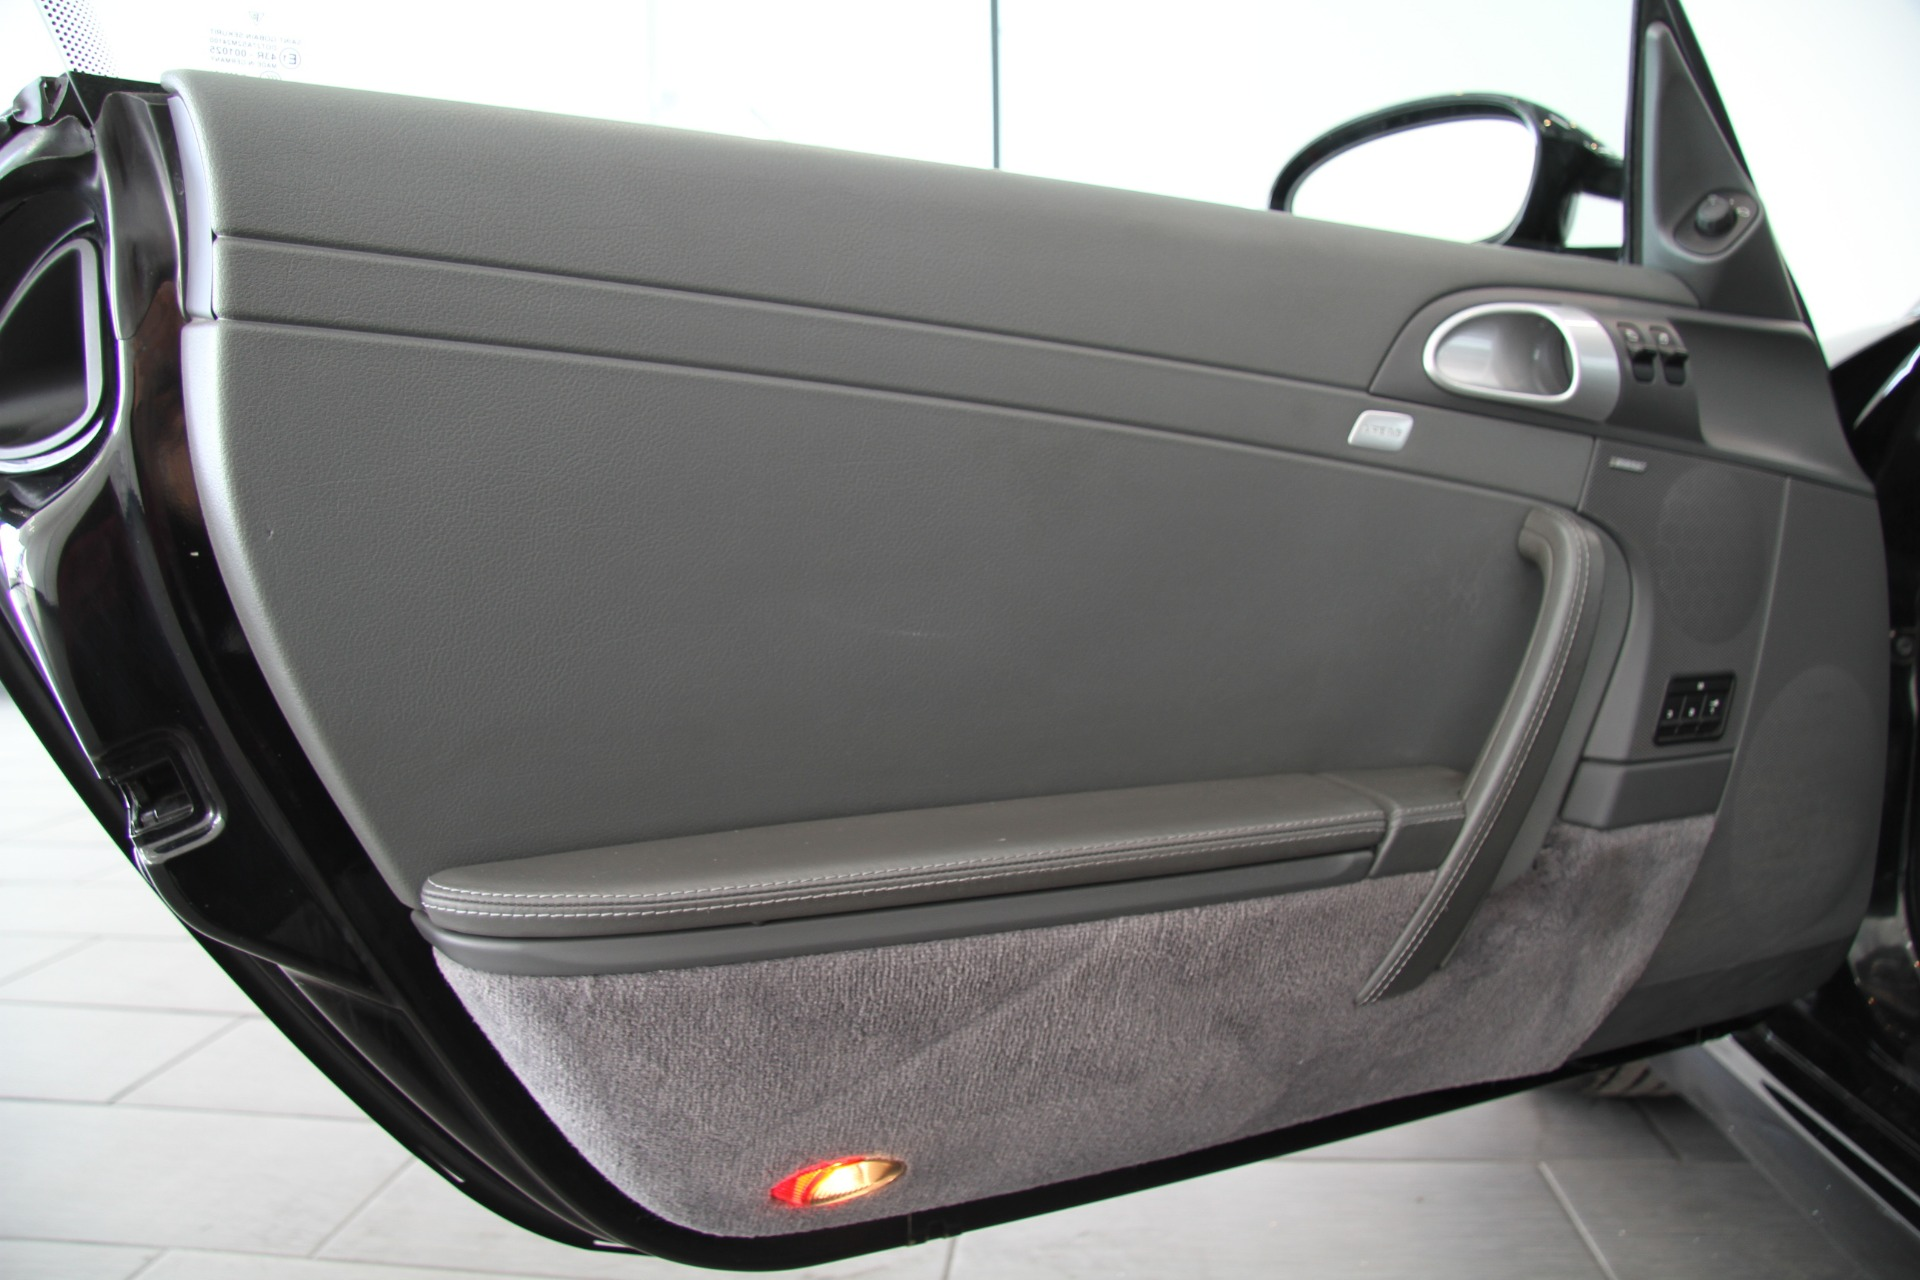 porsche carrera gt 6-speed manual for sale